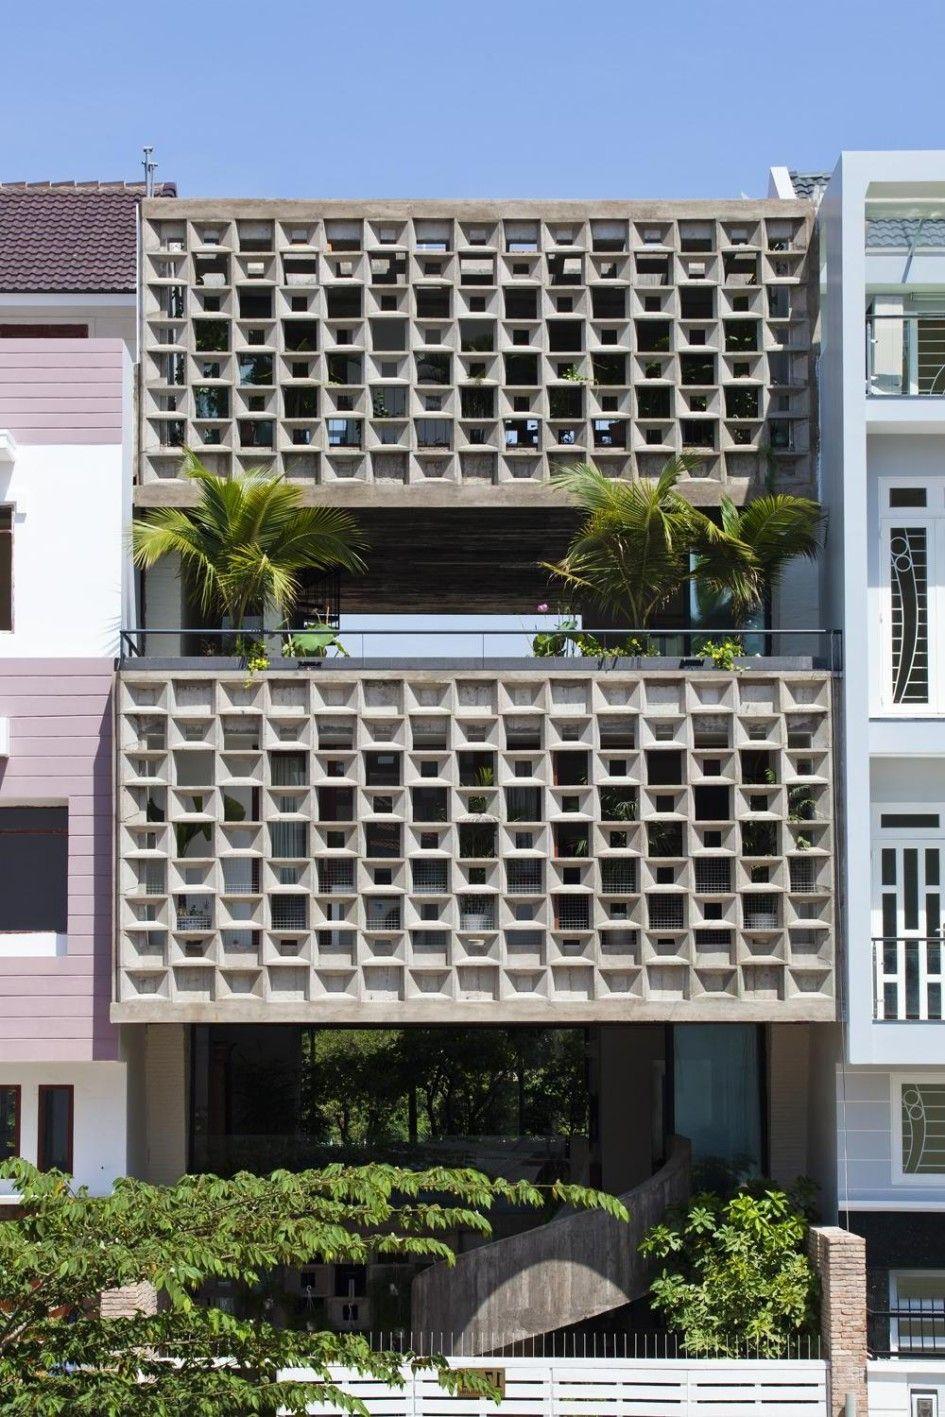 Eco House Design Hobart: Tropical House Facade With Eco Friendly House Design